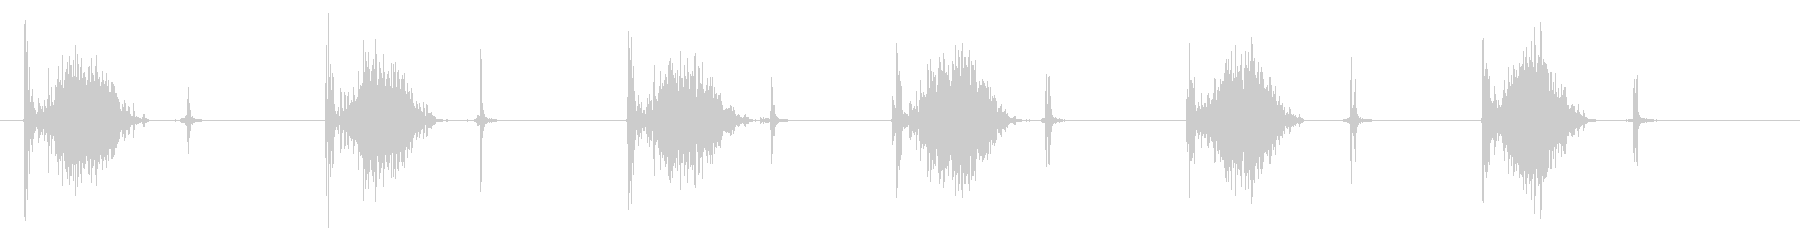 PC マウス ムーブ02-06(ハード)の未再生の波形